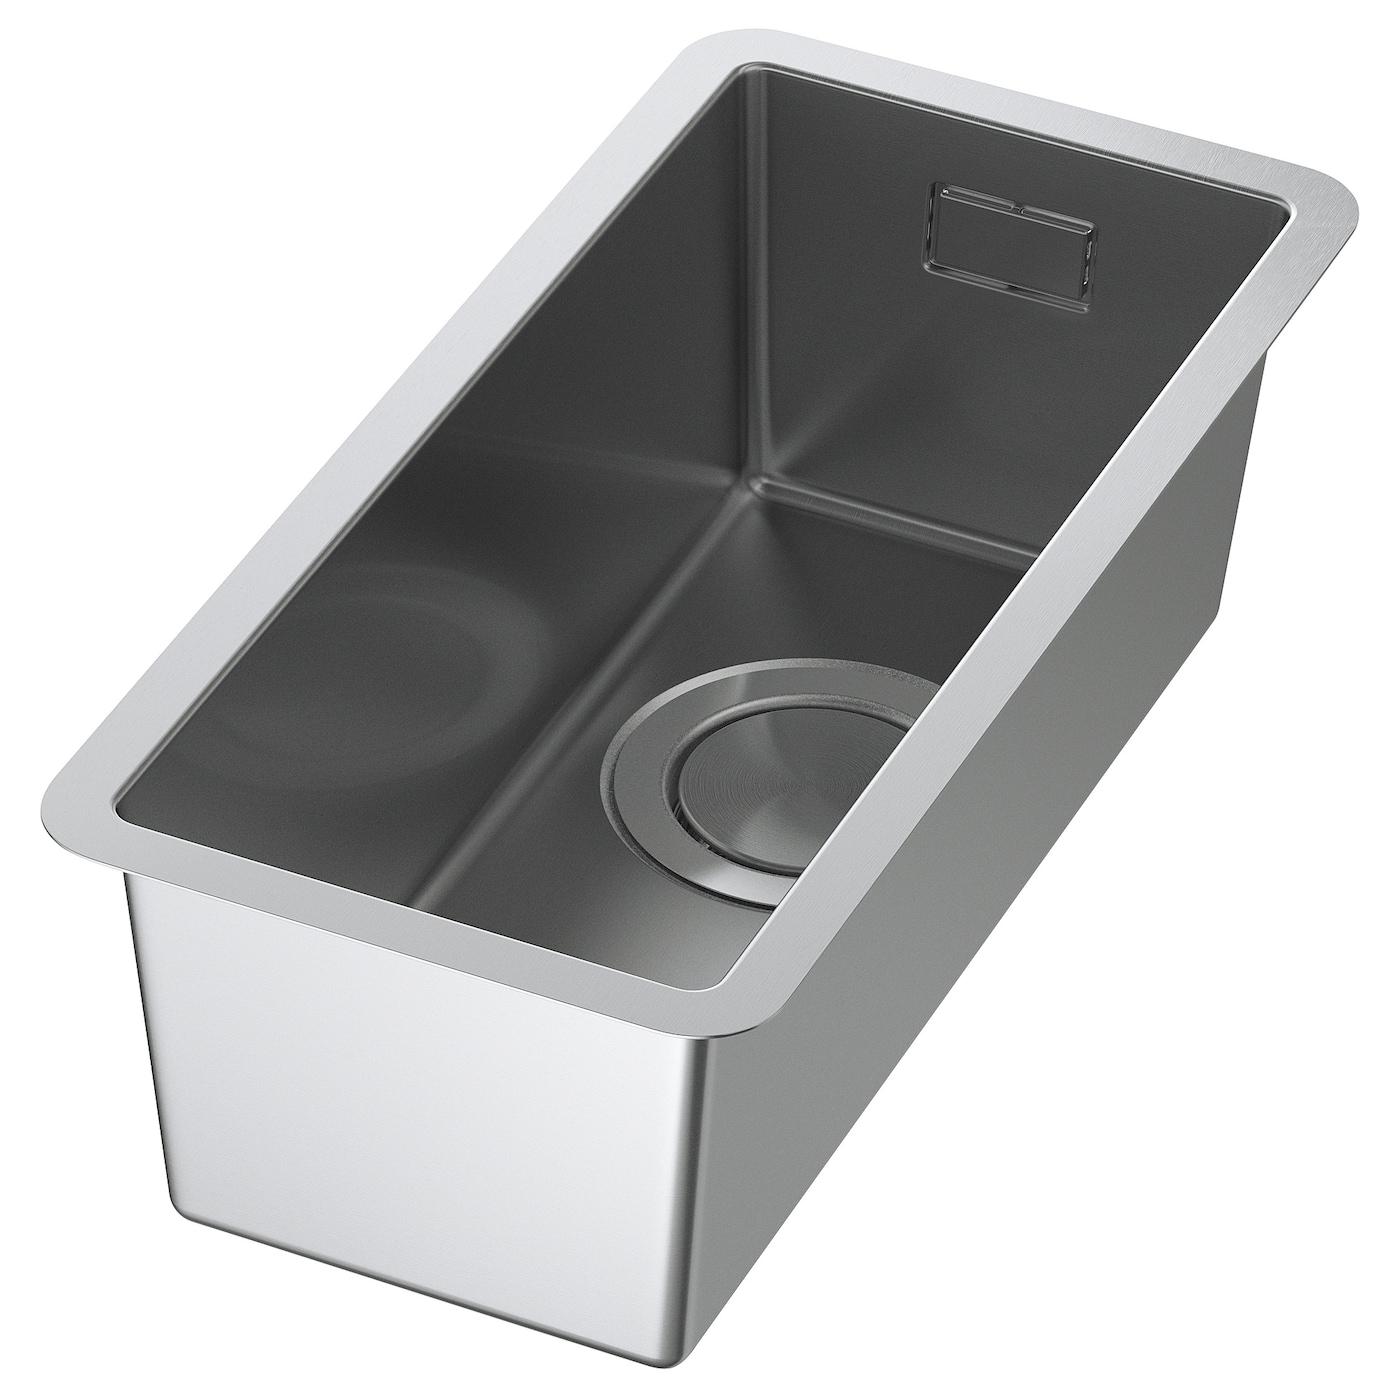 Kitchen sinks single double stainless steel sinks ikea for Evier inox ikea